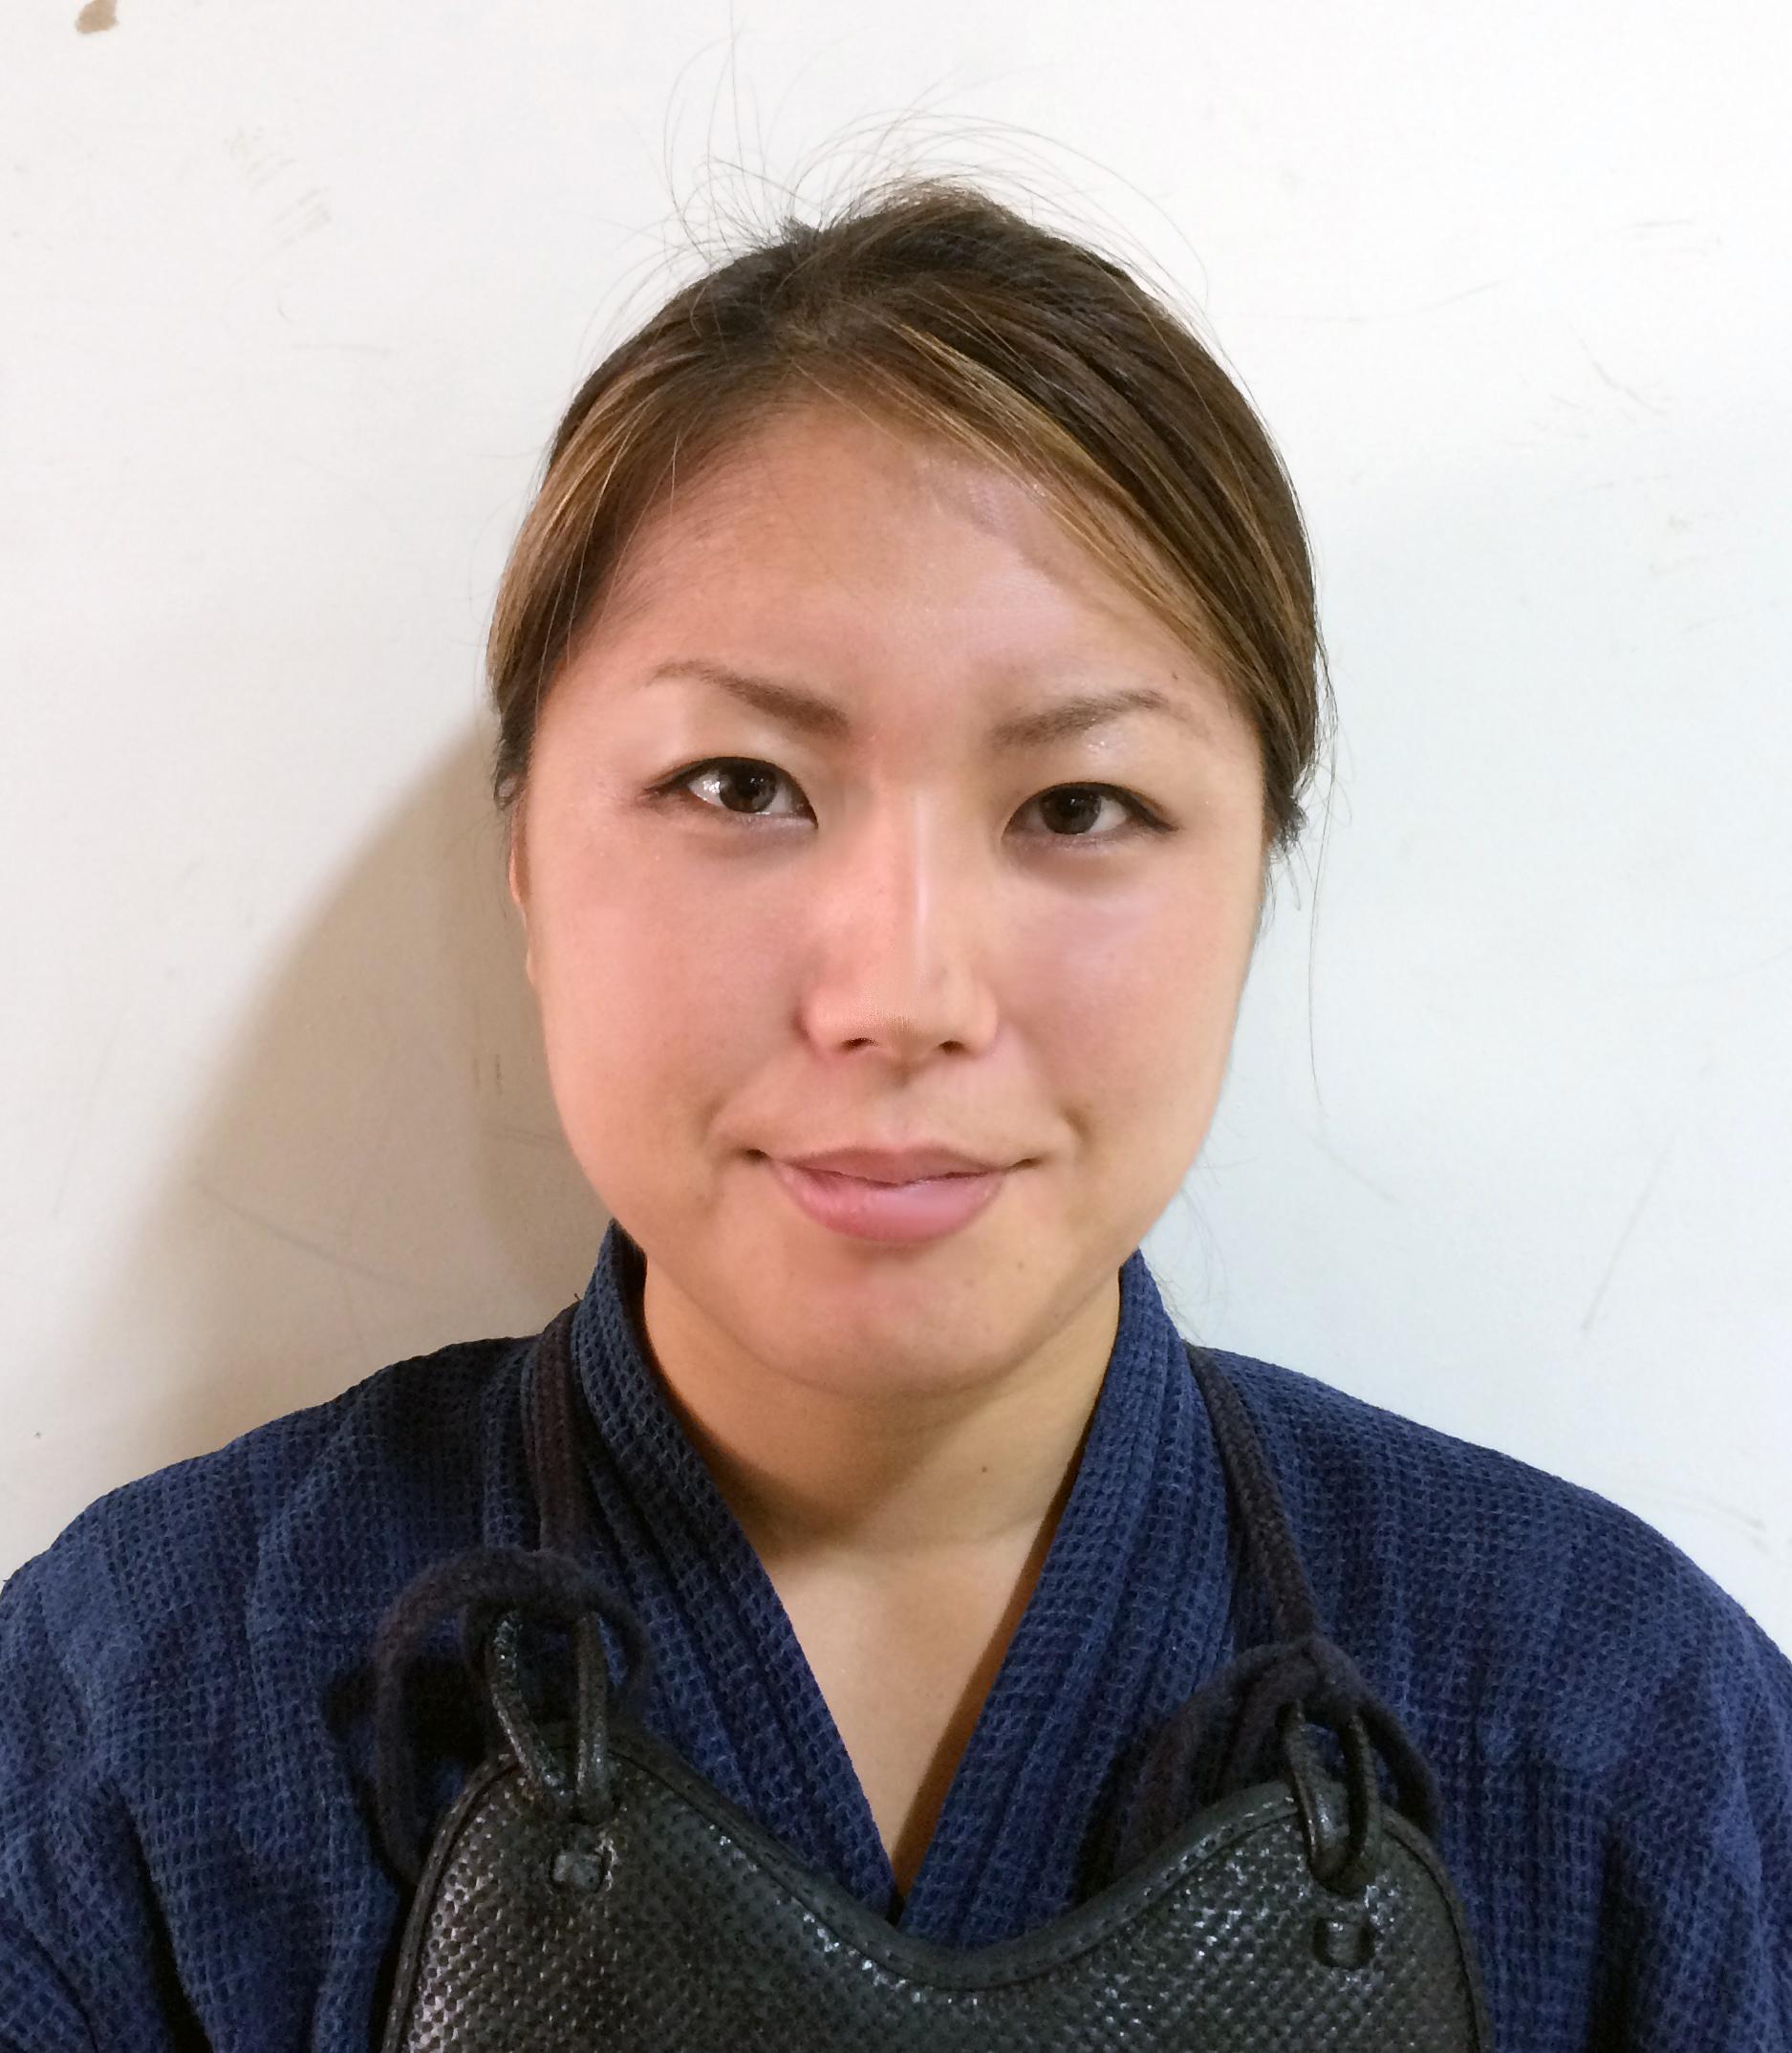 Hisano Hsueh